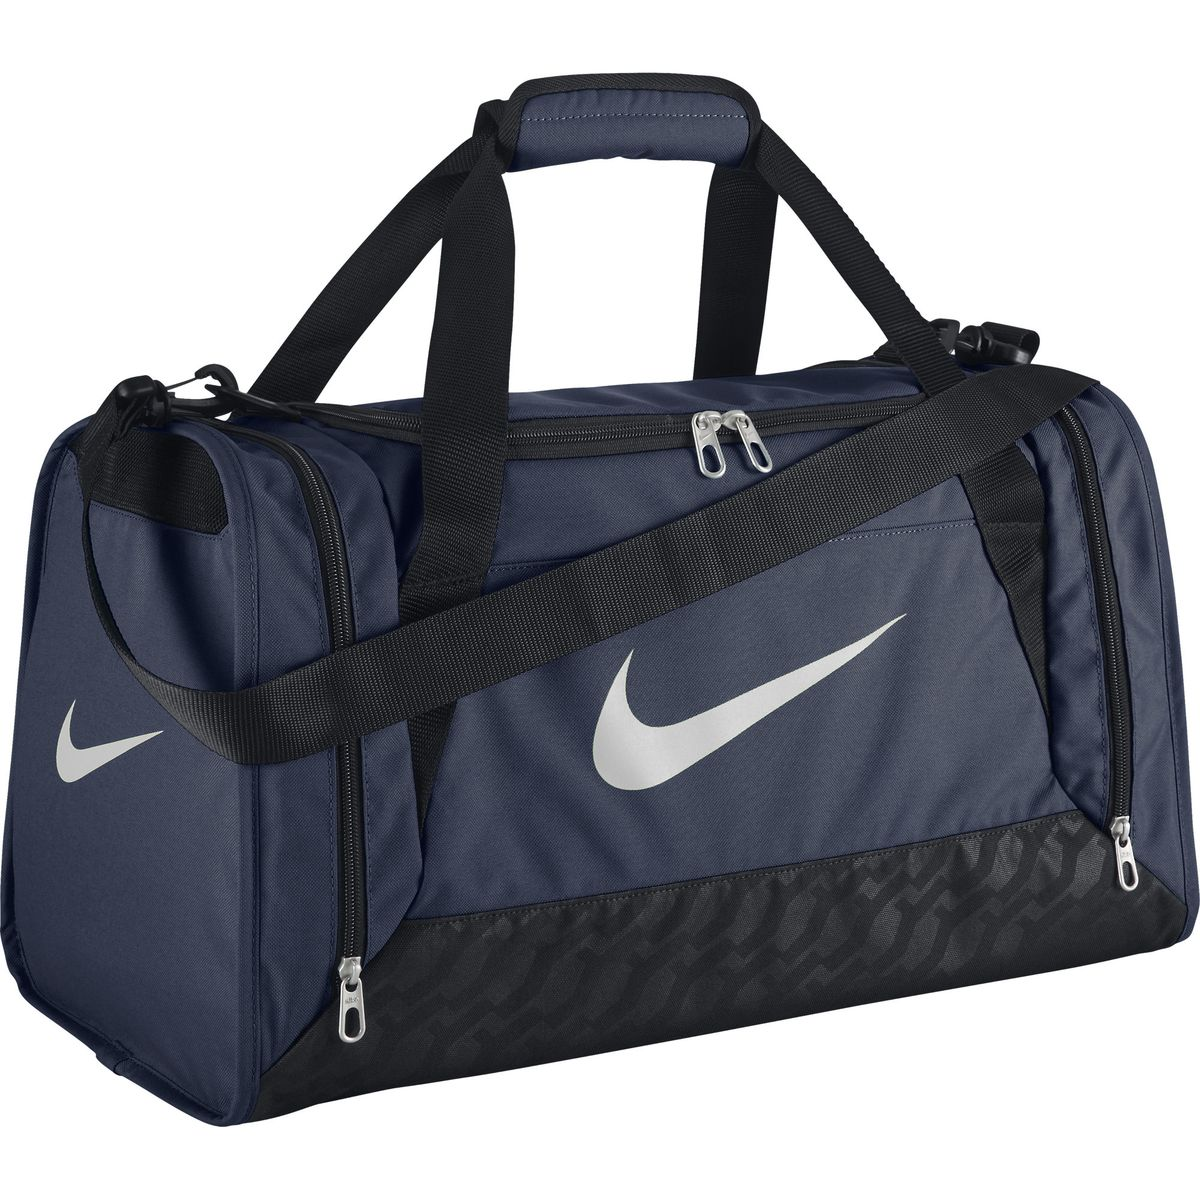 Сумка спортивная Nike Brasilia 6 Small Duffel, цвет: темно-синий, 44,4 л